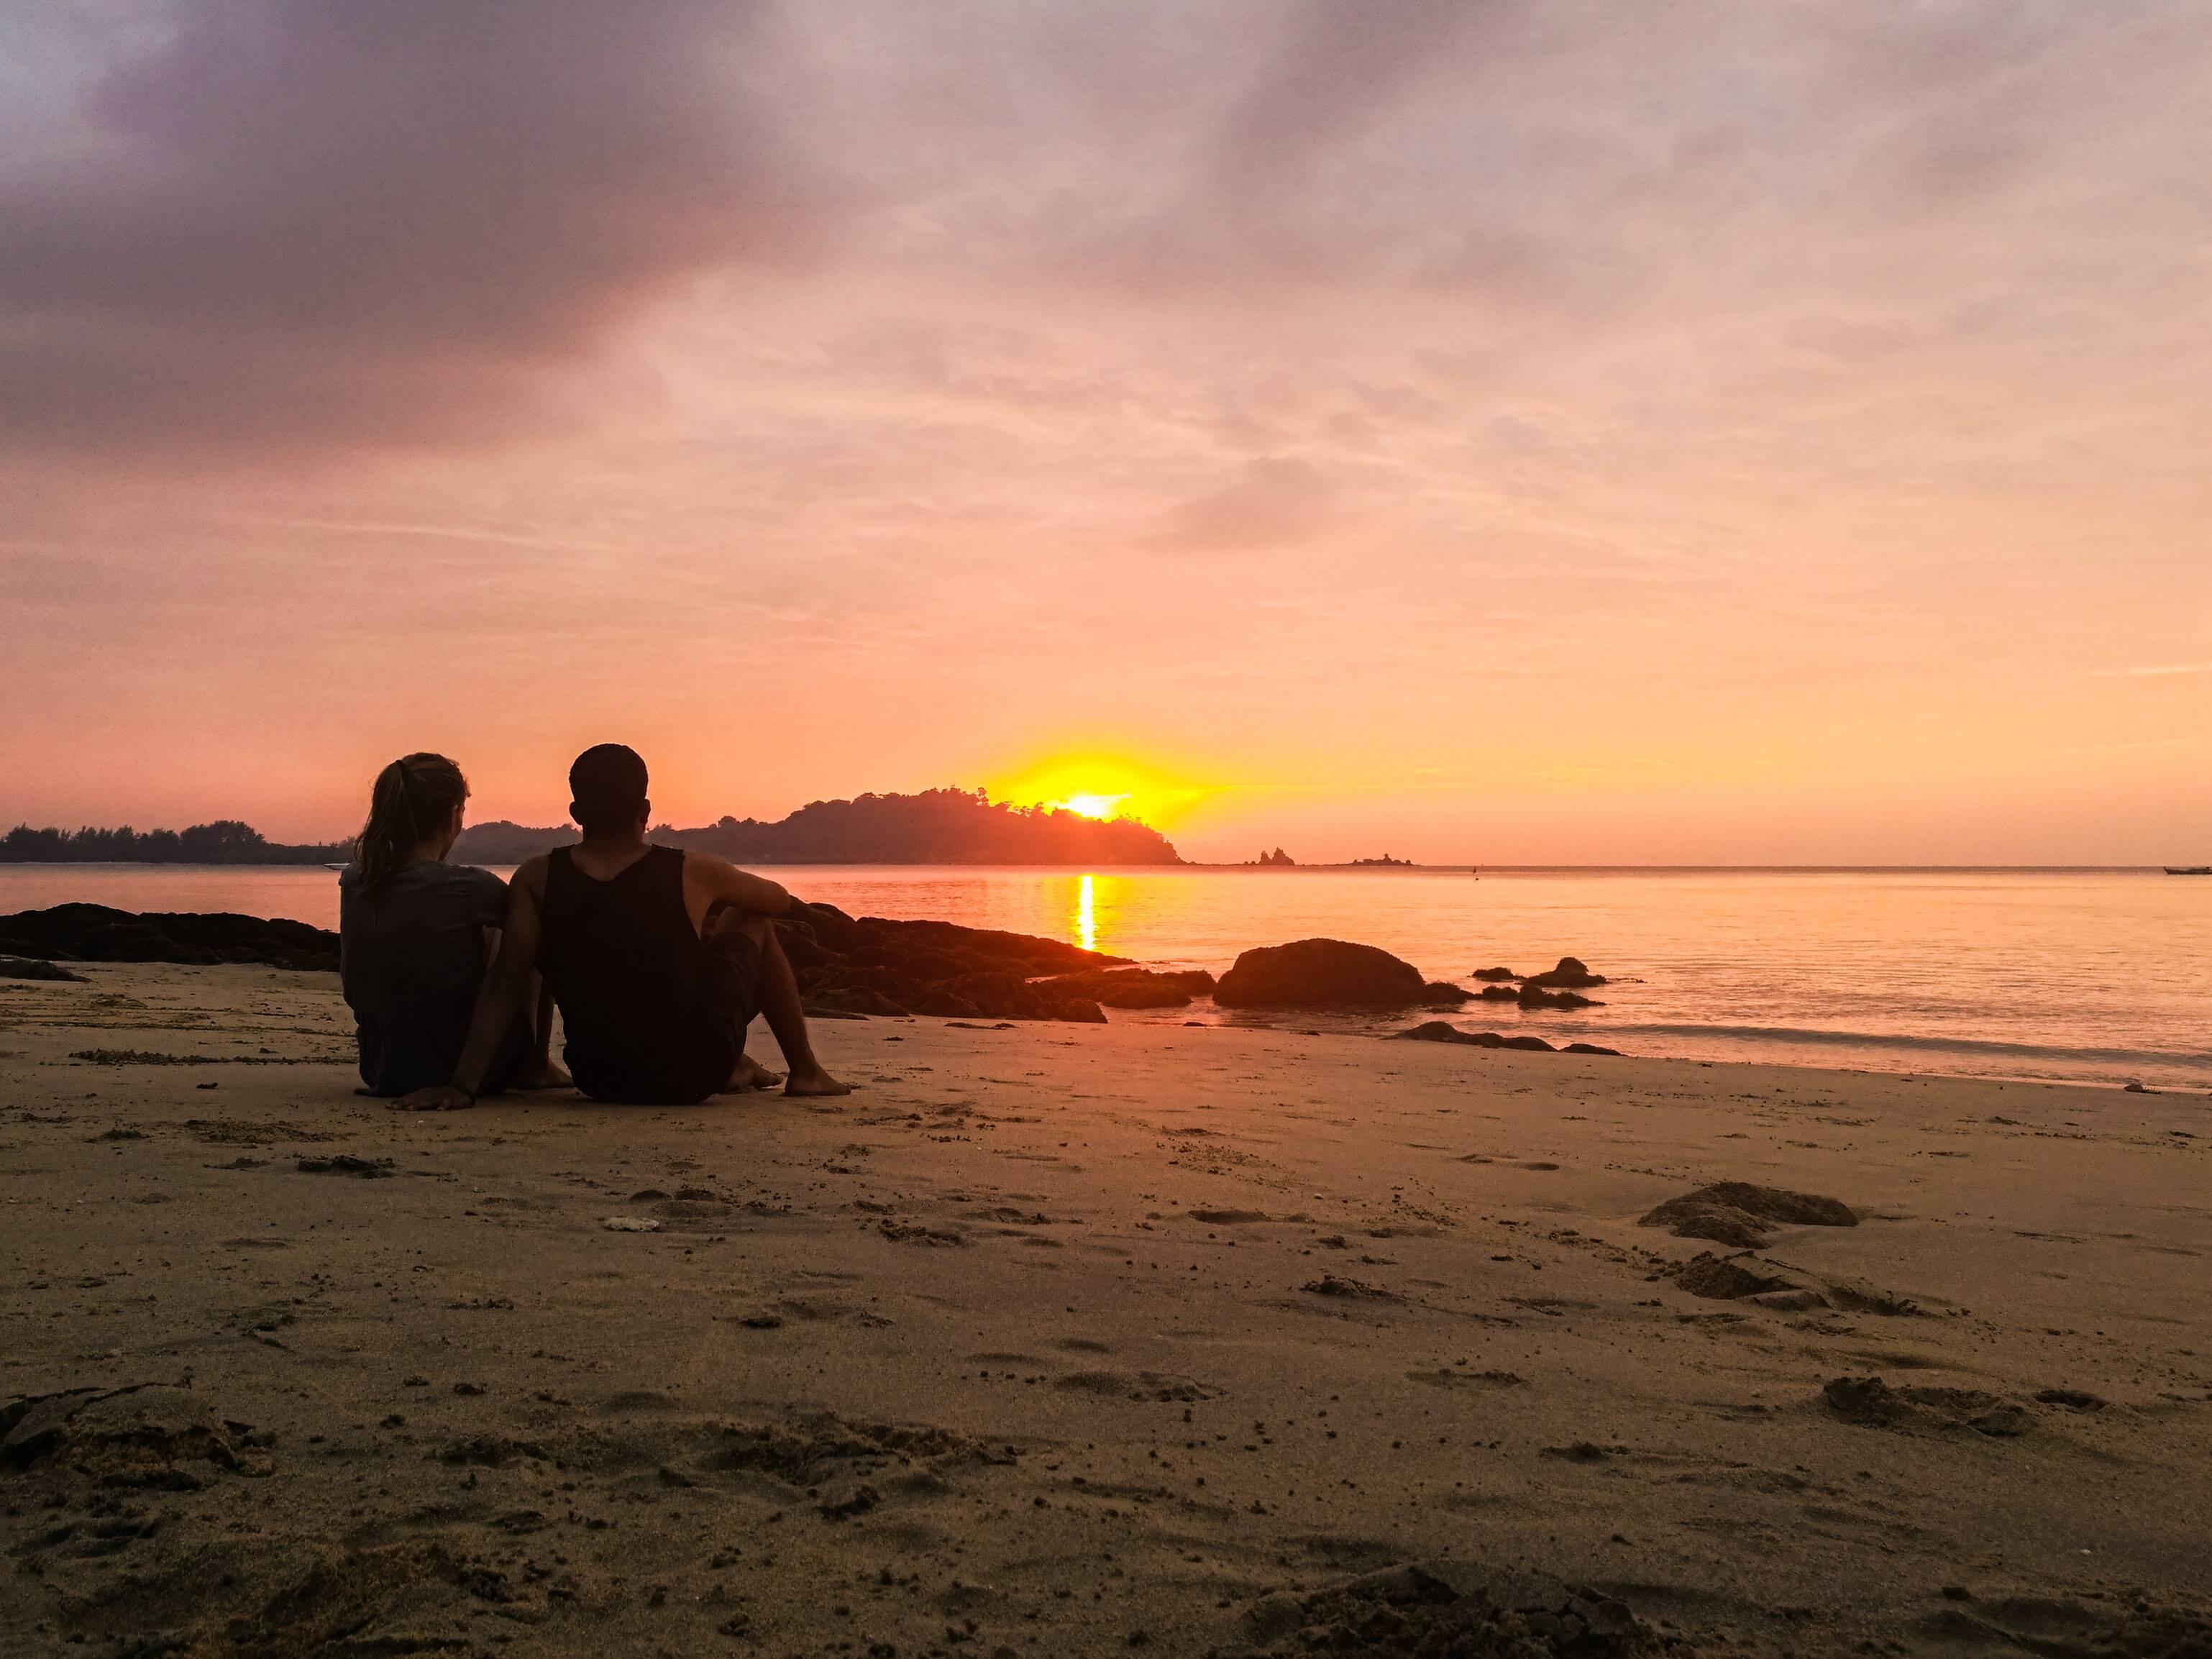 Pôr do sol em Khao Kwai, Buffalo Bay - Koh Phayam